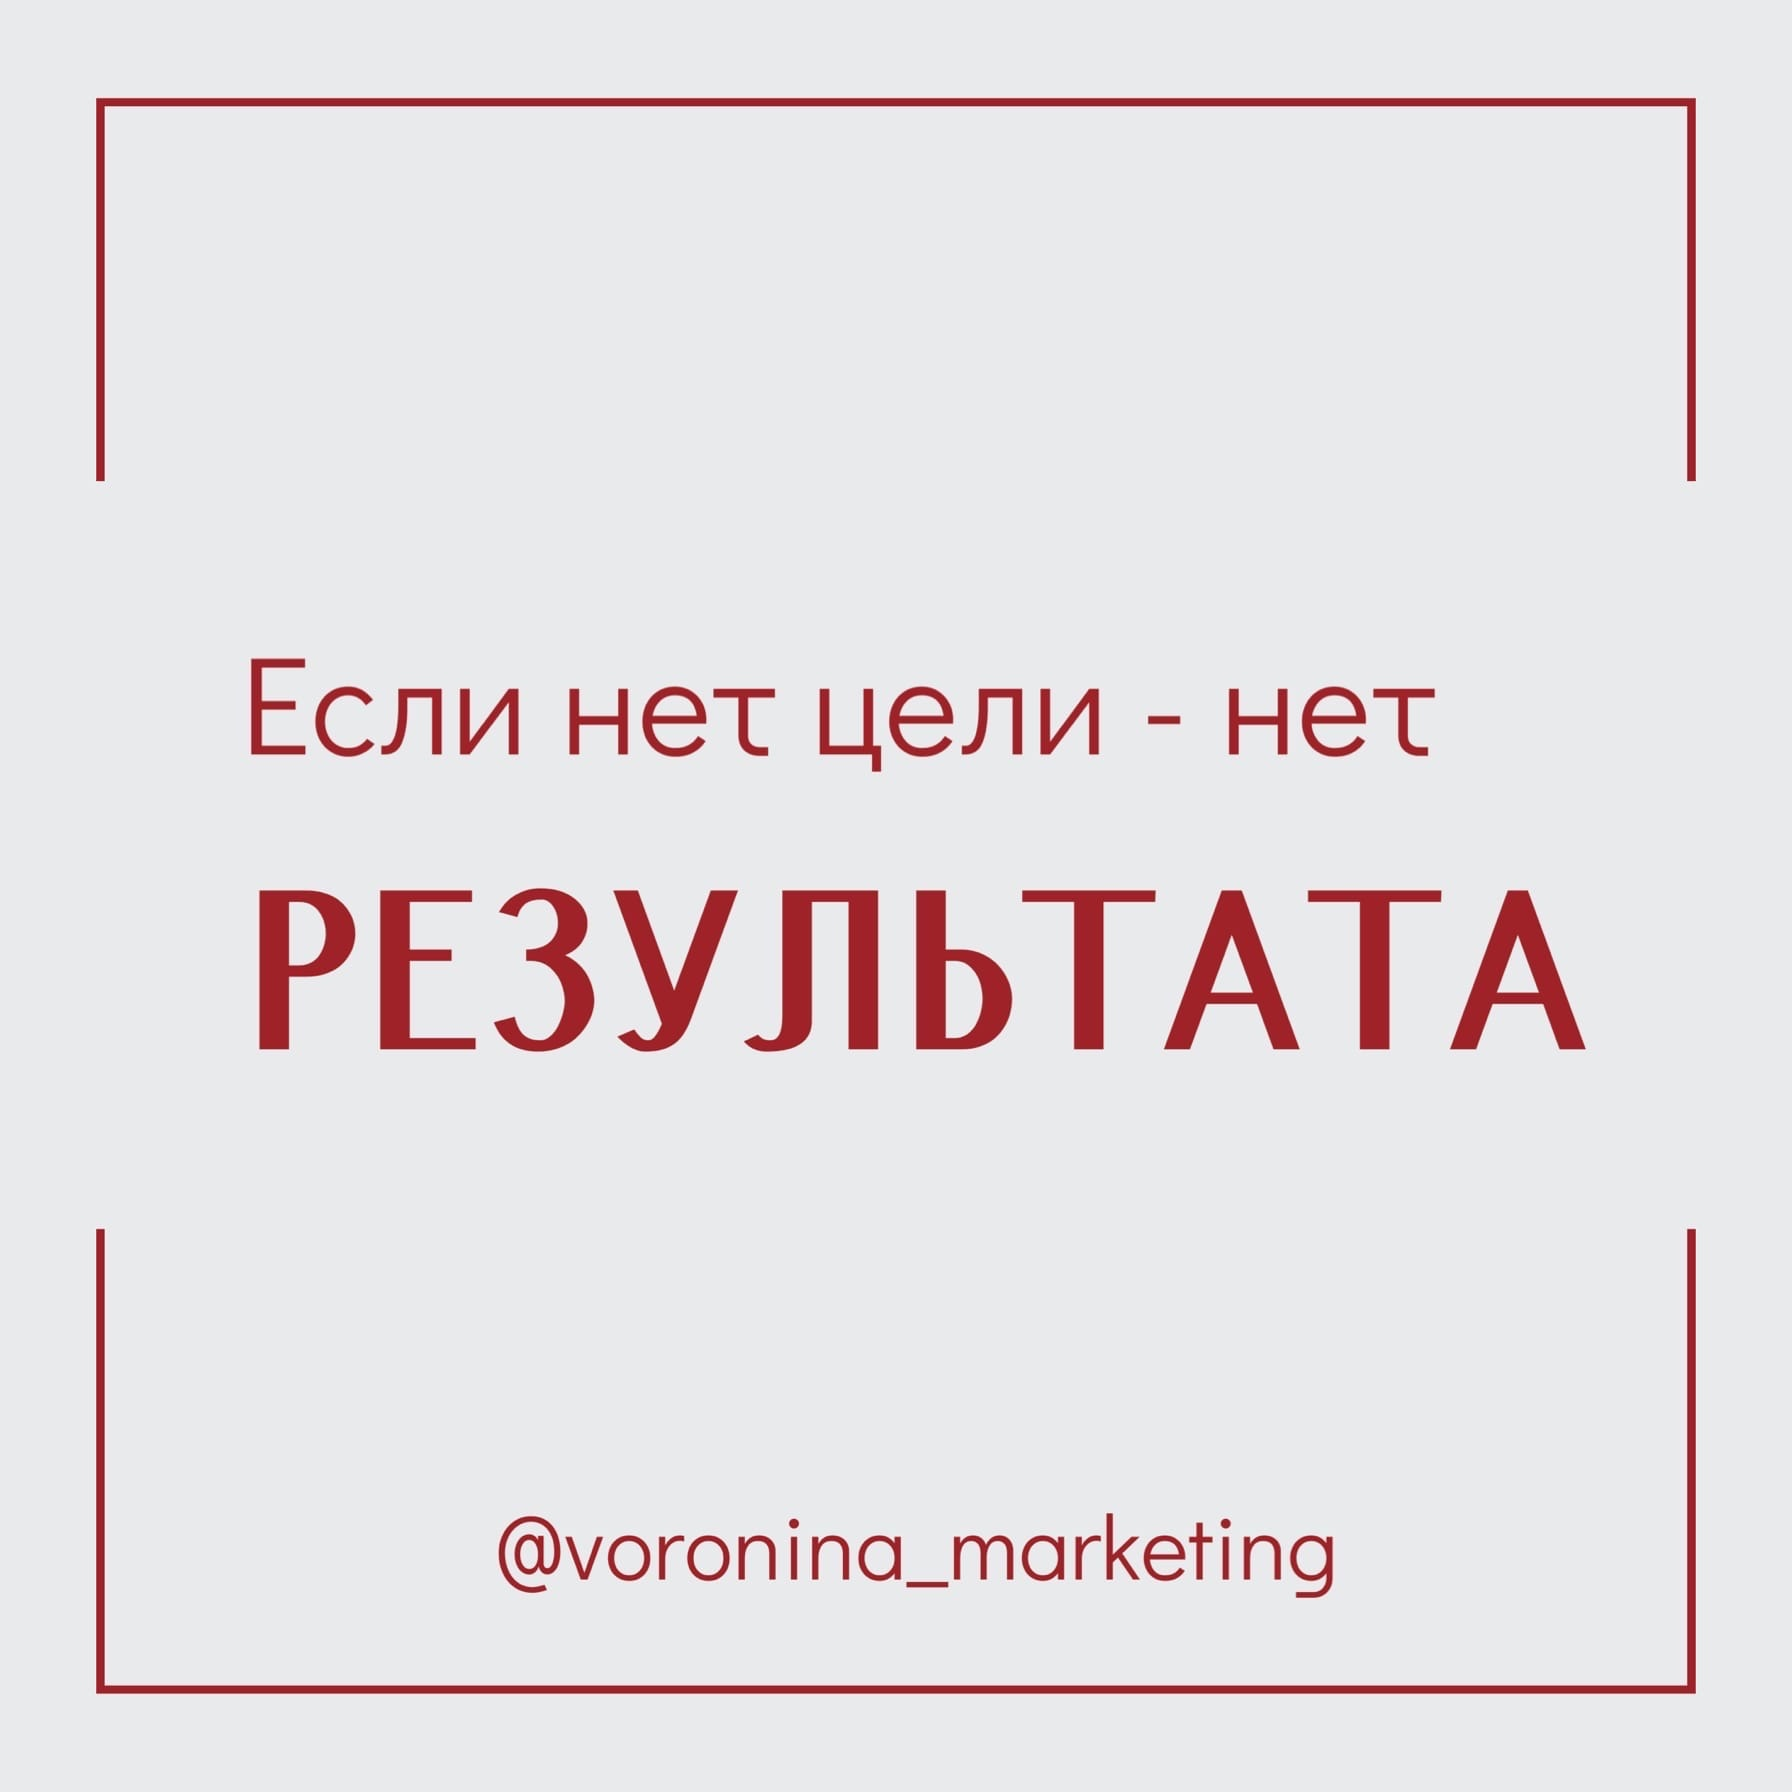 Блог о маркетинге